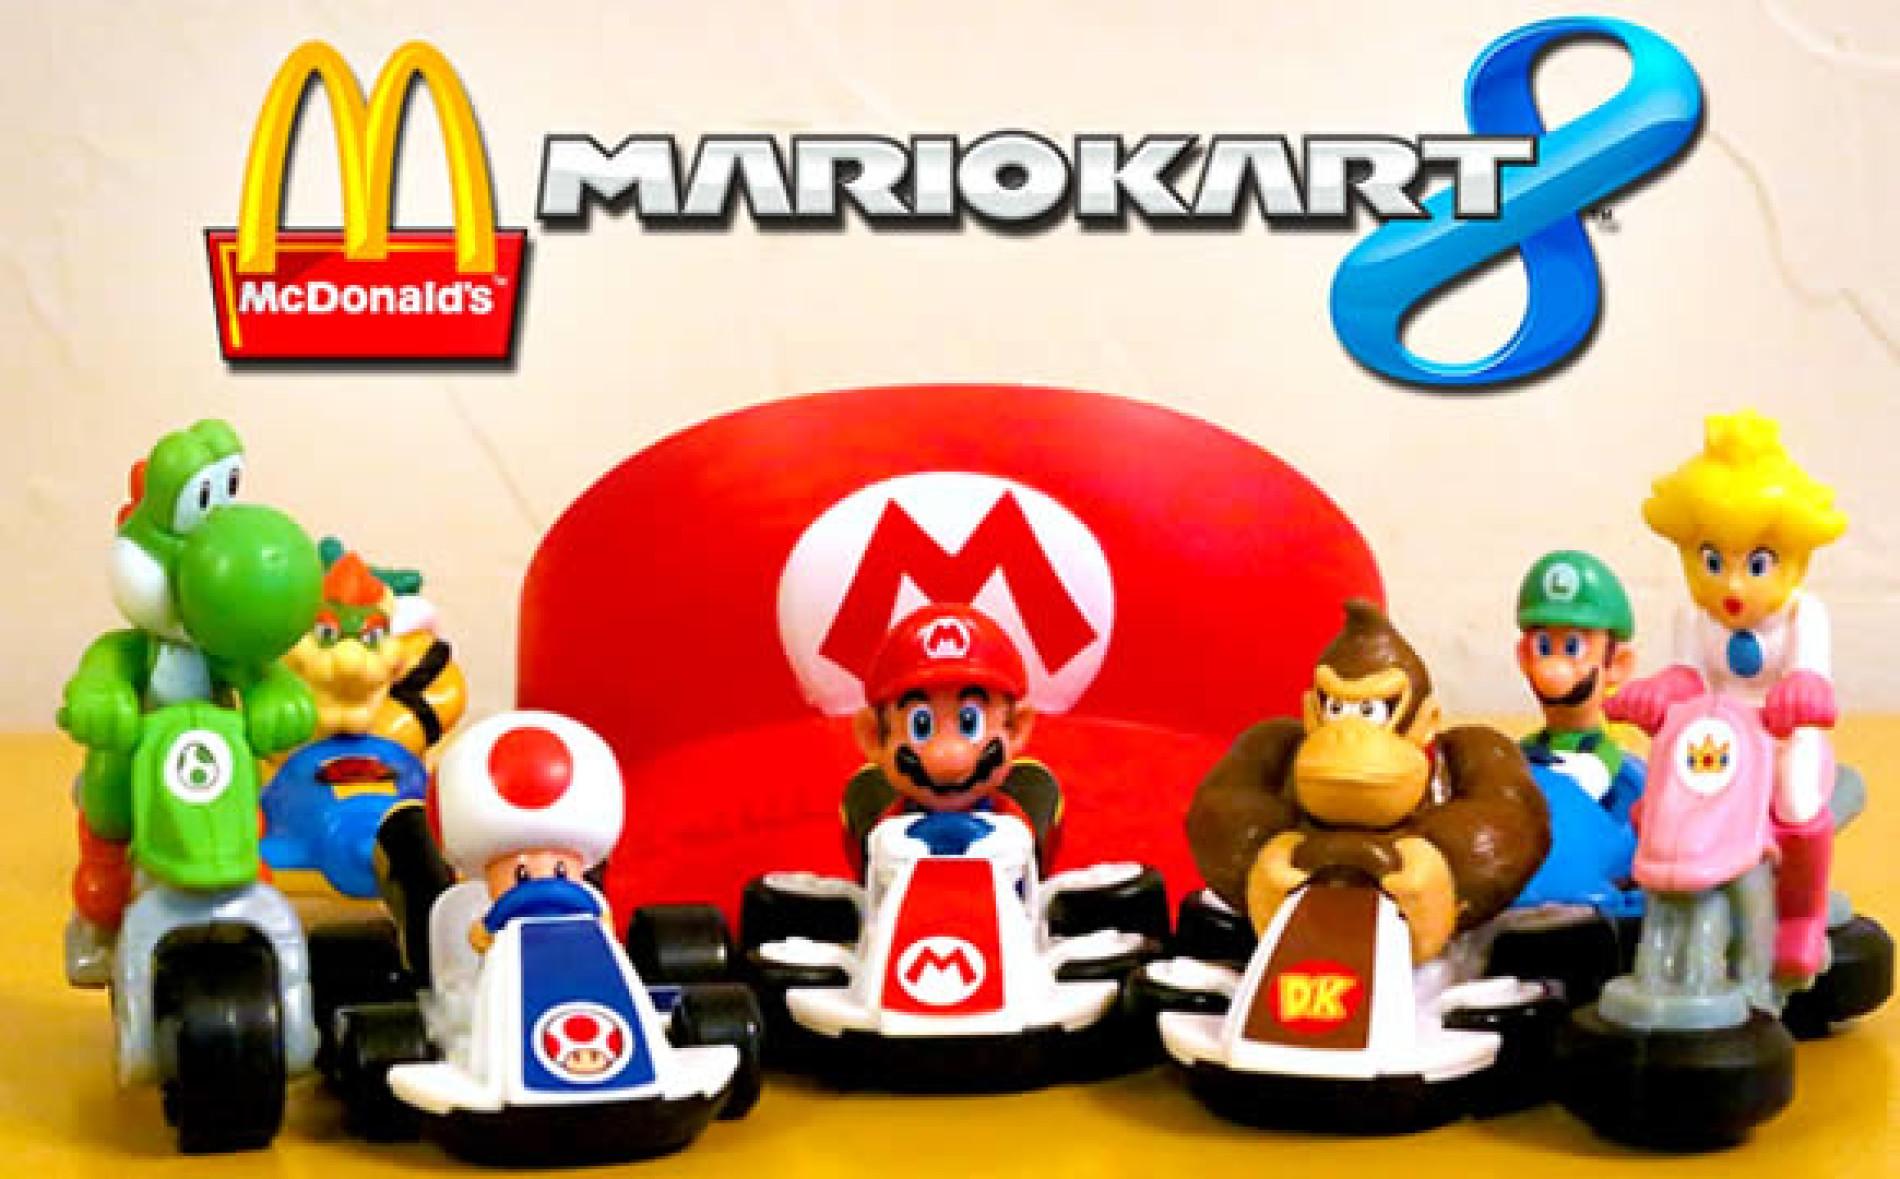 Mario Kart 8 no MCDonalds a partir deste dia 7 de outubro